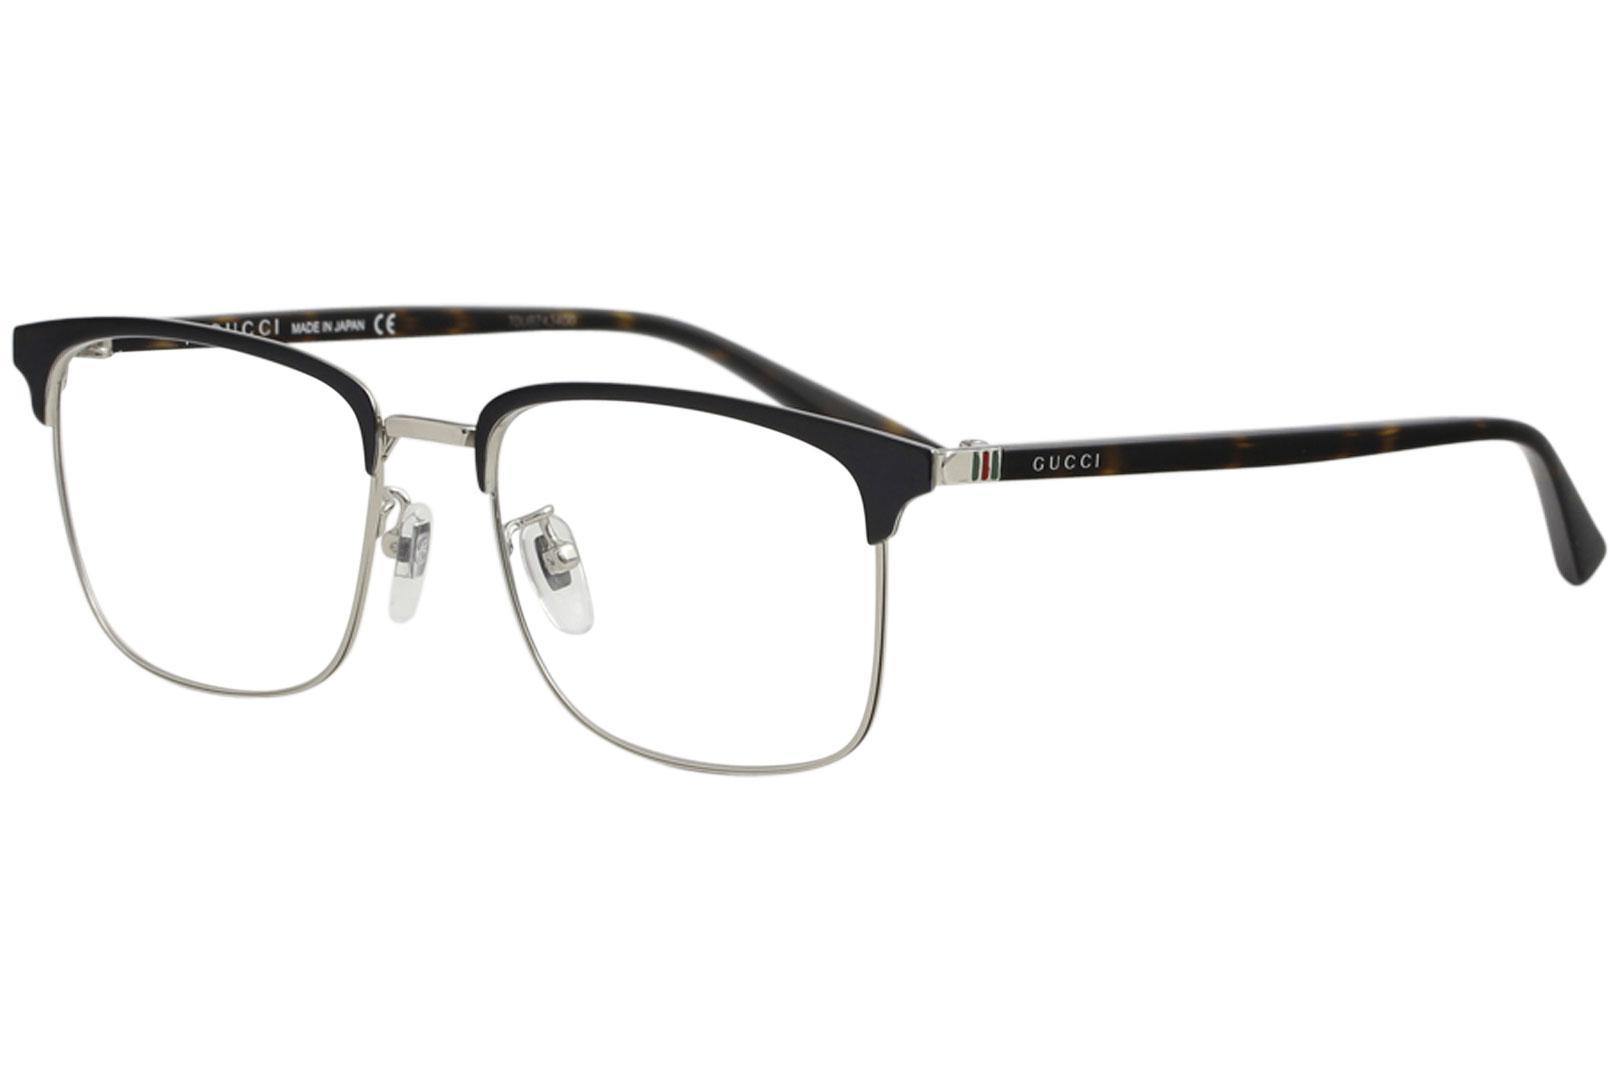 d2ab641acc82 Gucci men eyeglasses o full rim optical frame jpg 1620x1080 Gucci frame